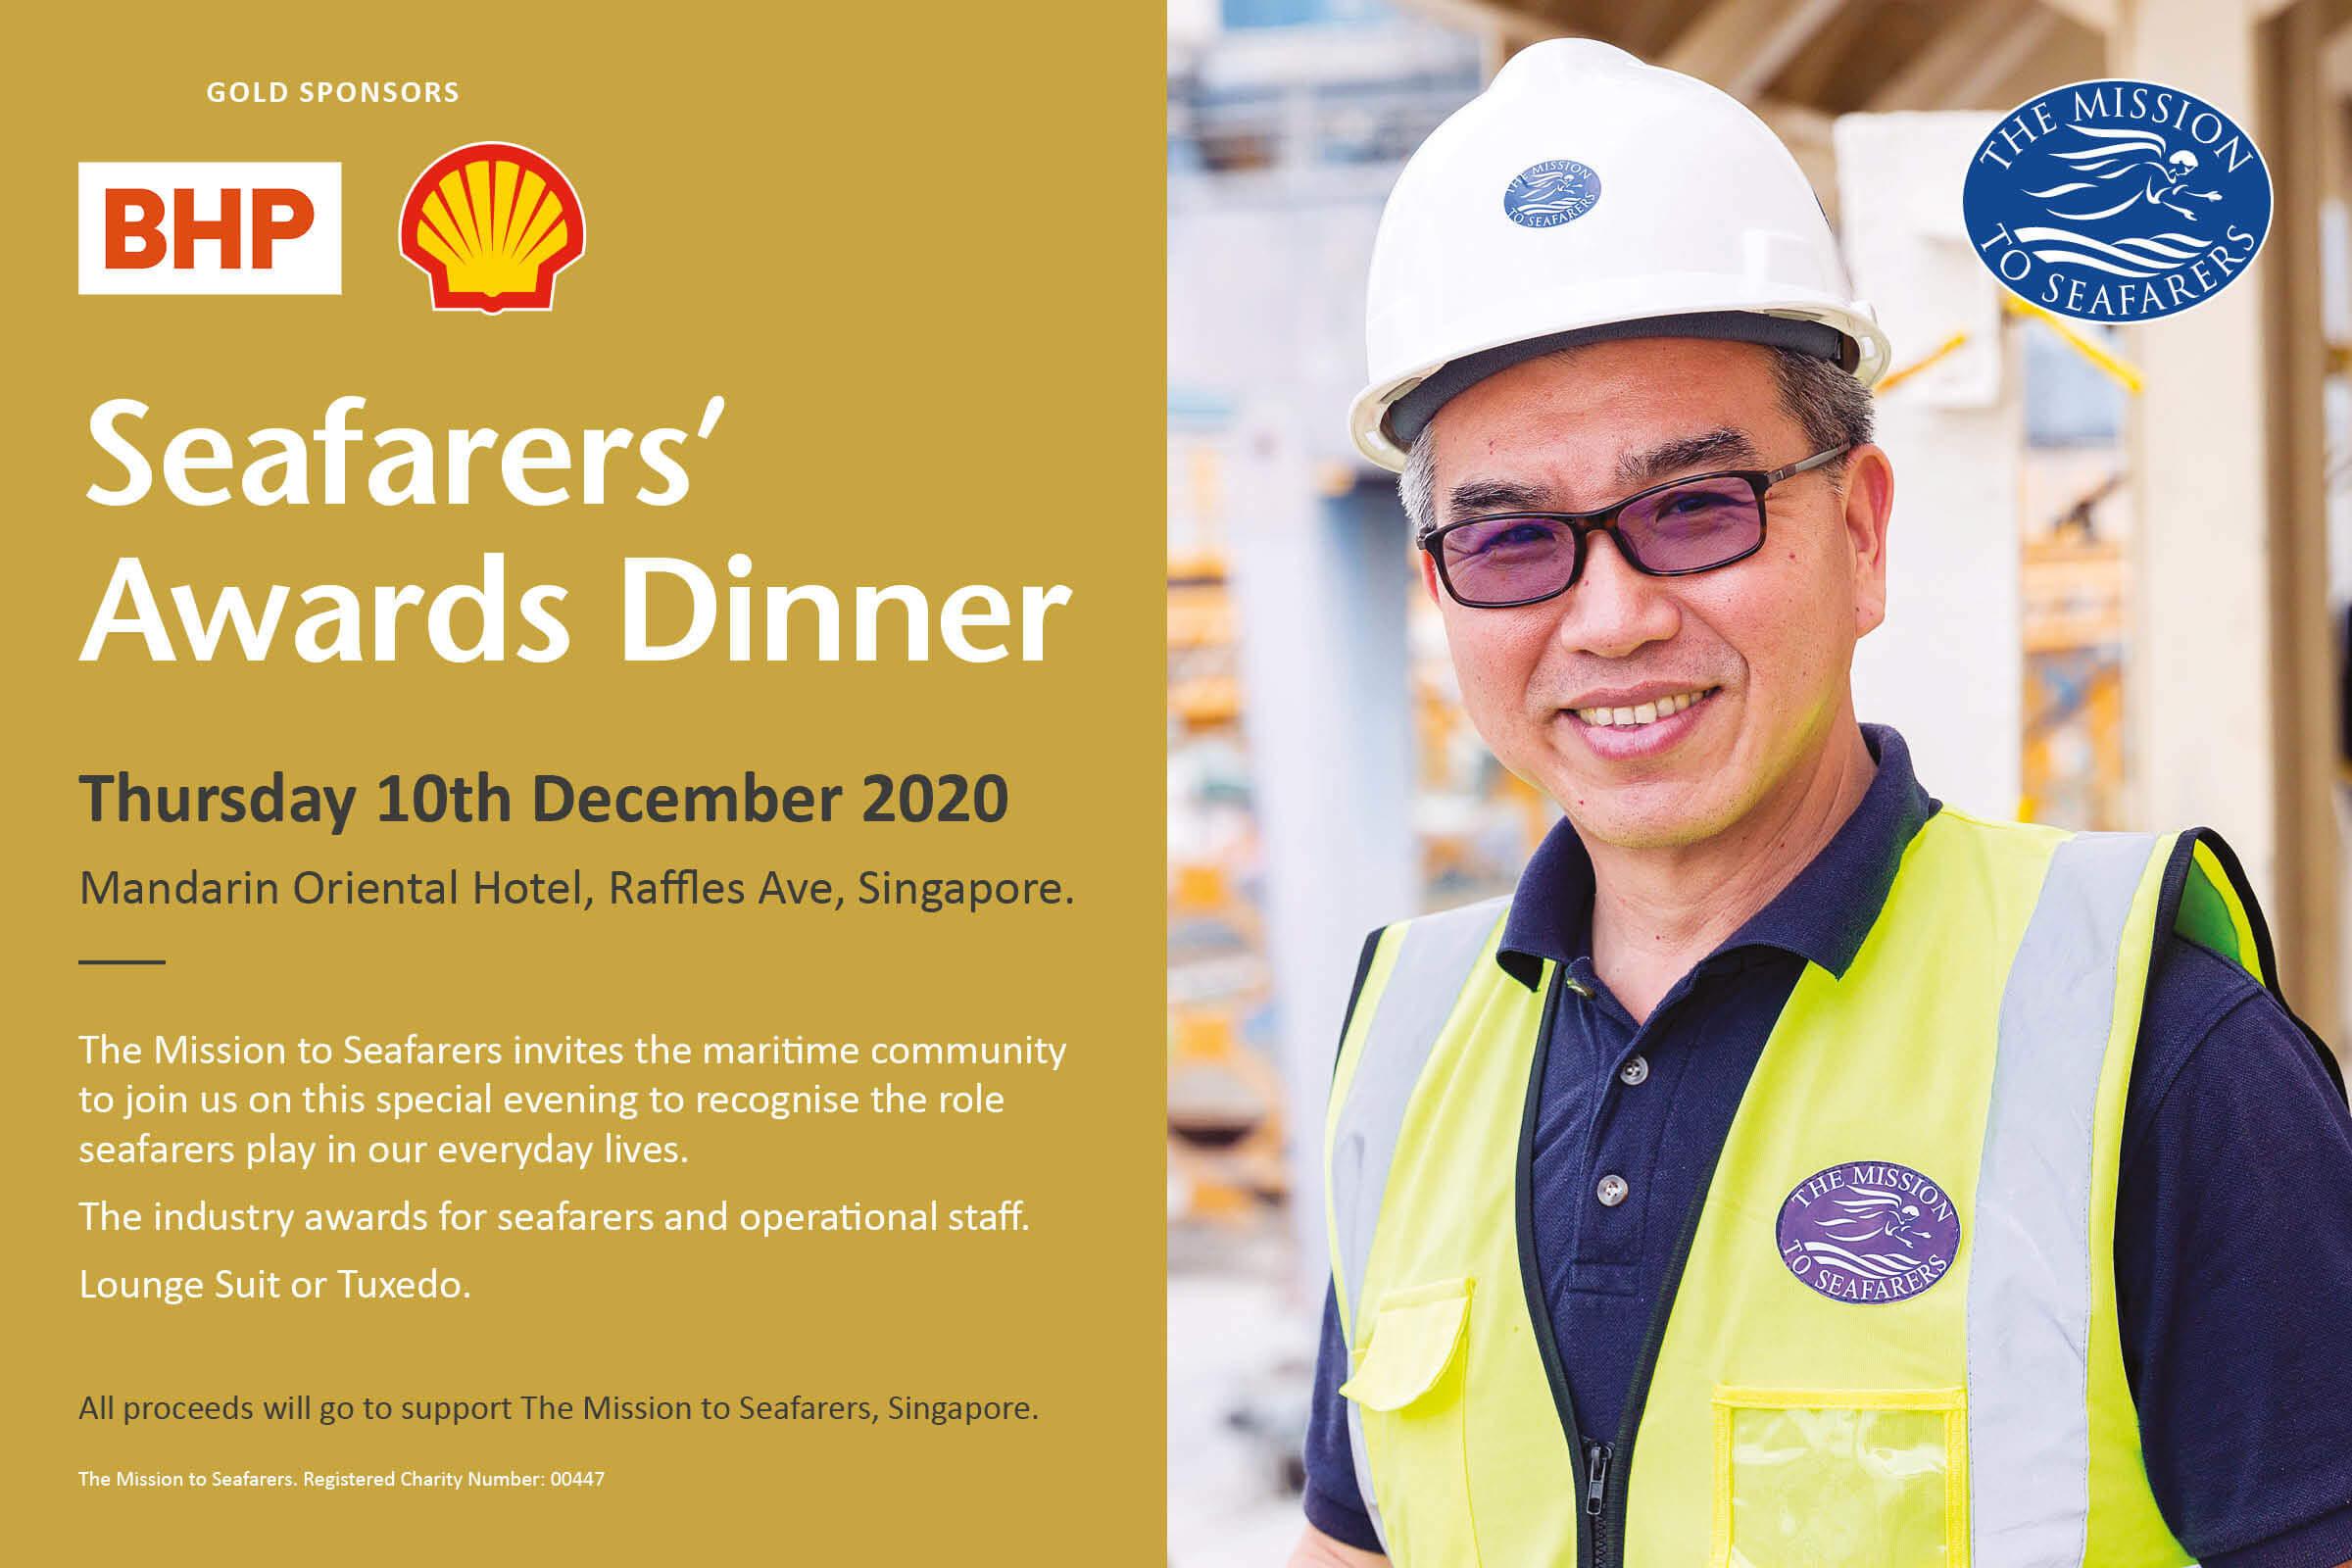 The Mission to Seafarers, Singapore, Seafarers' Awards